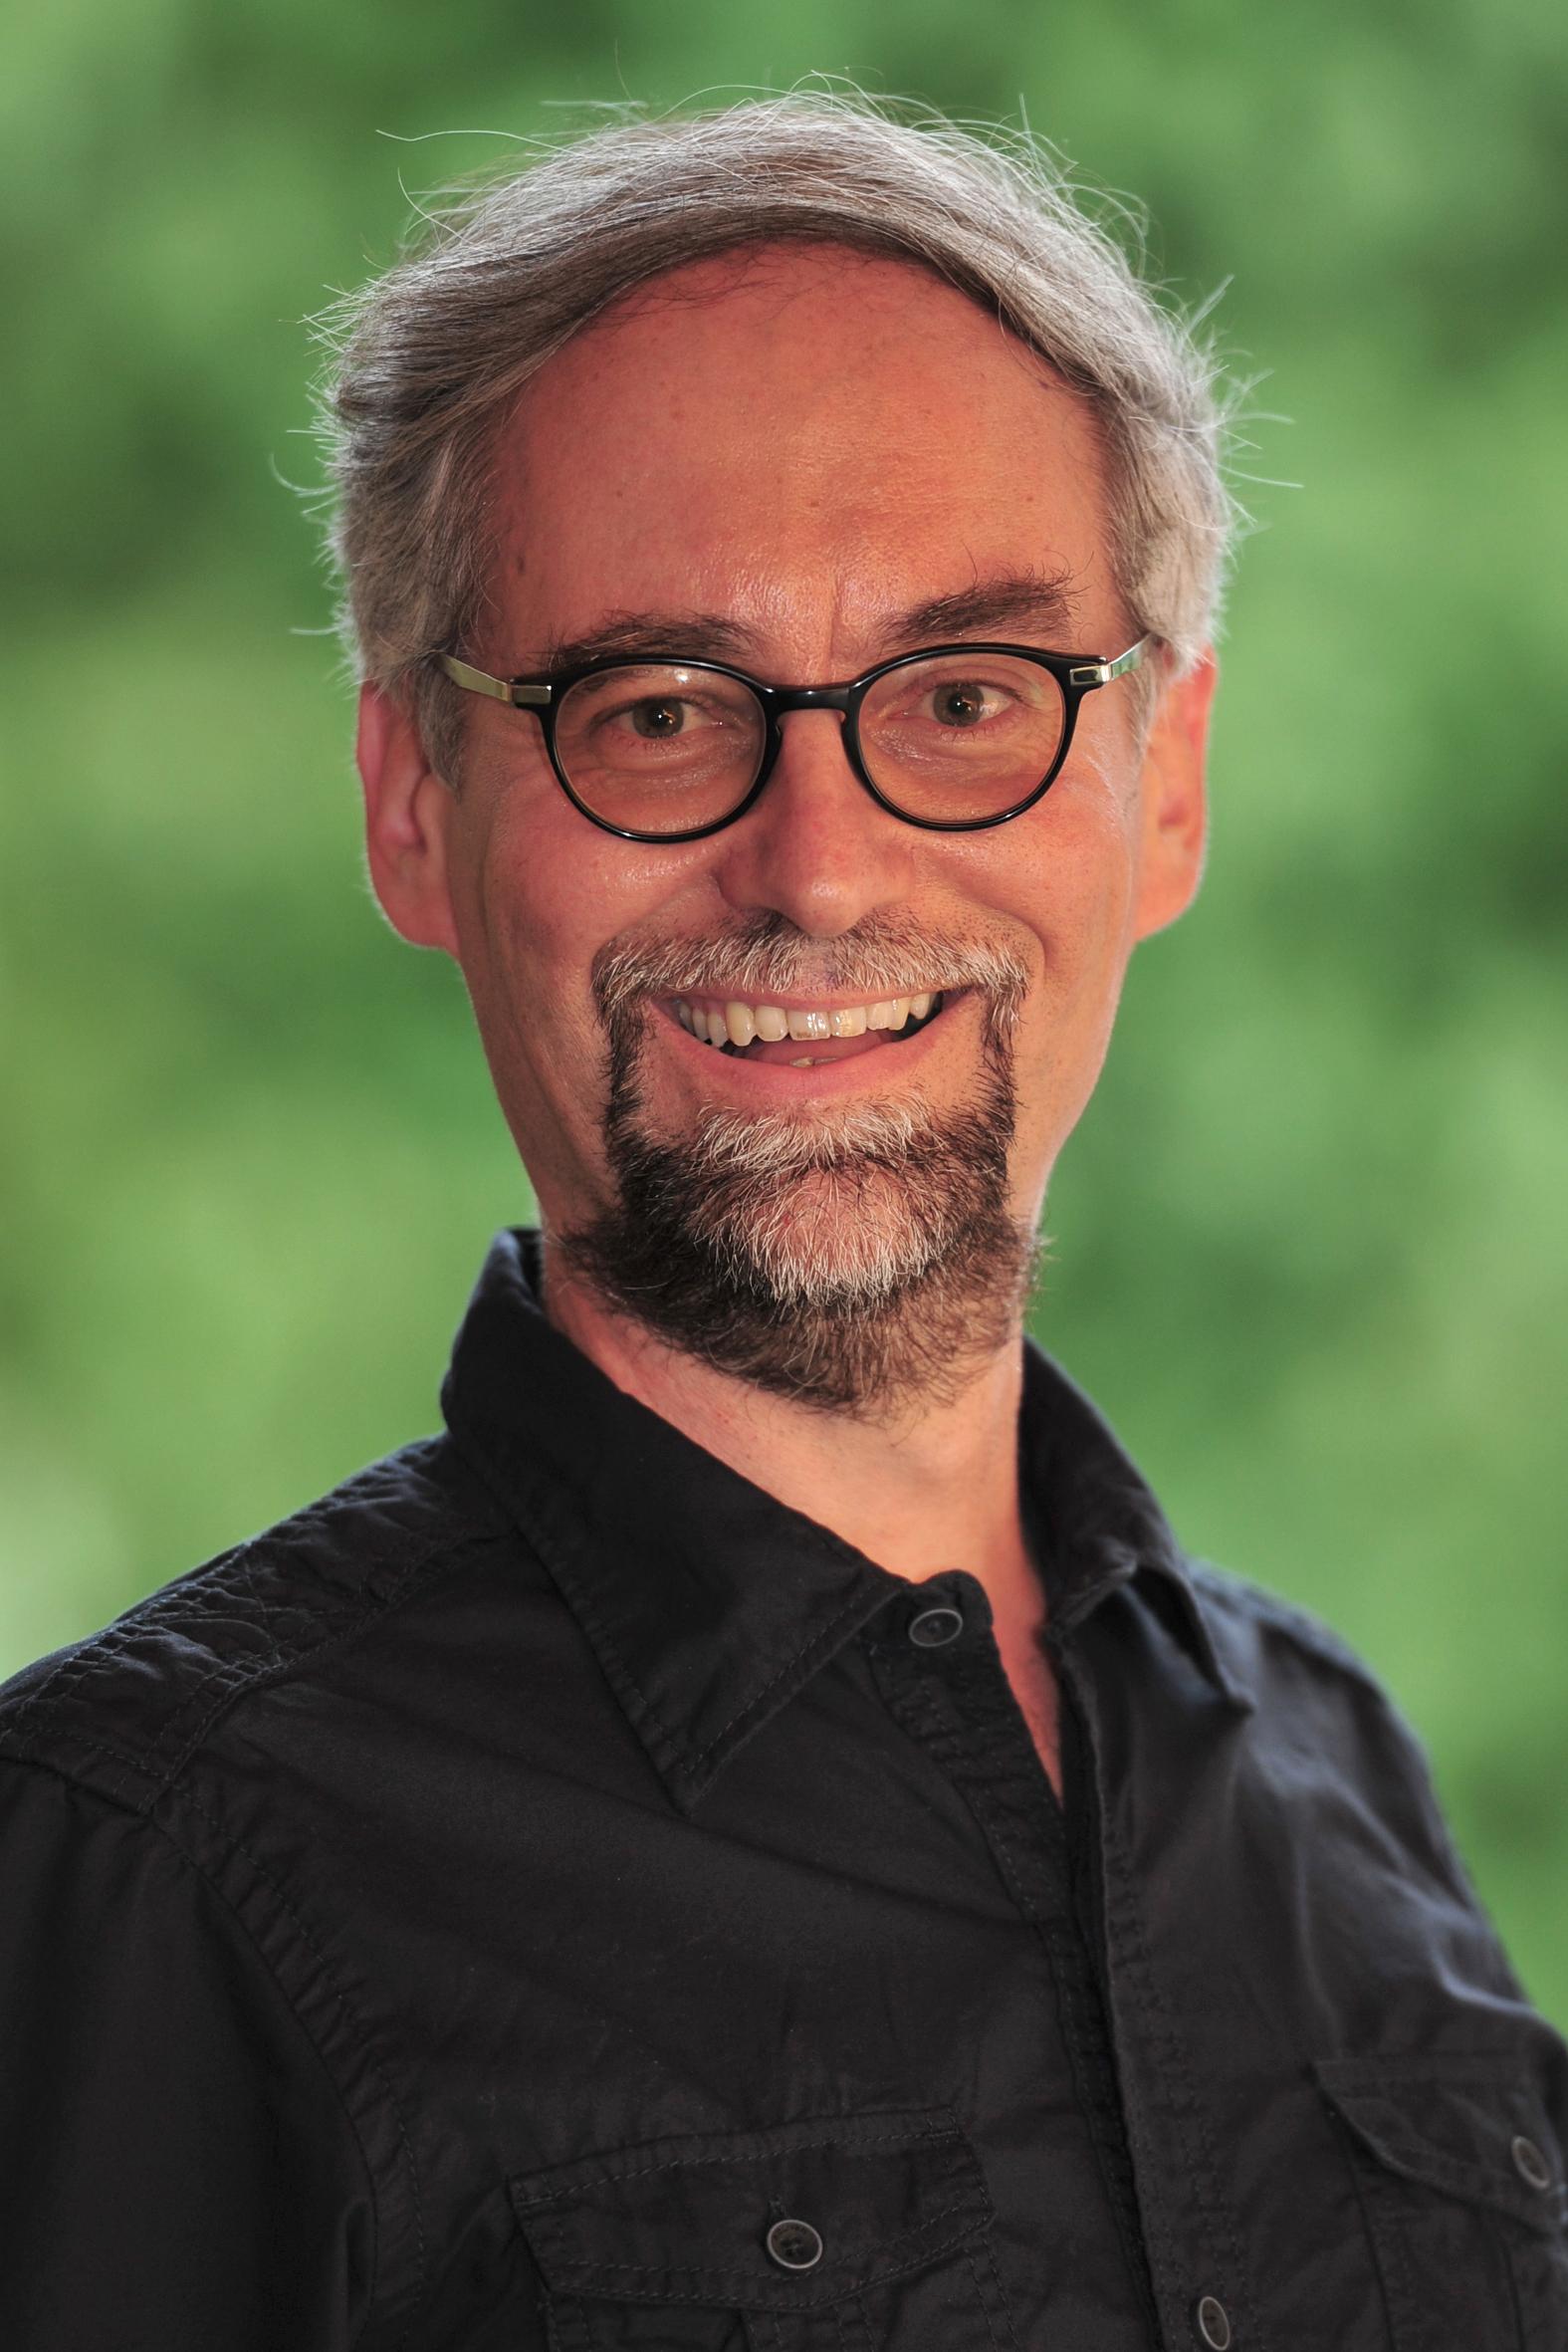 Portrait – Gerhard M. Walch